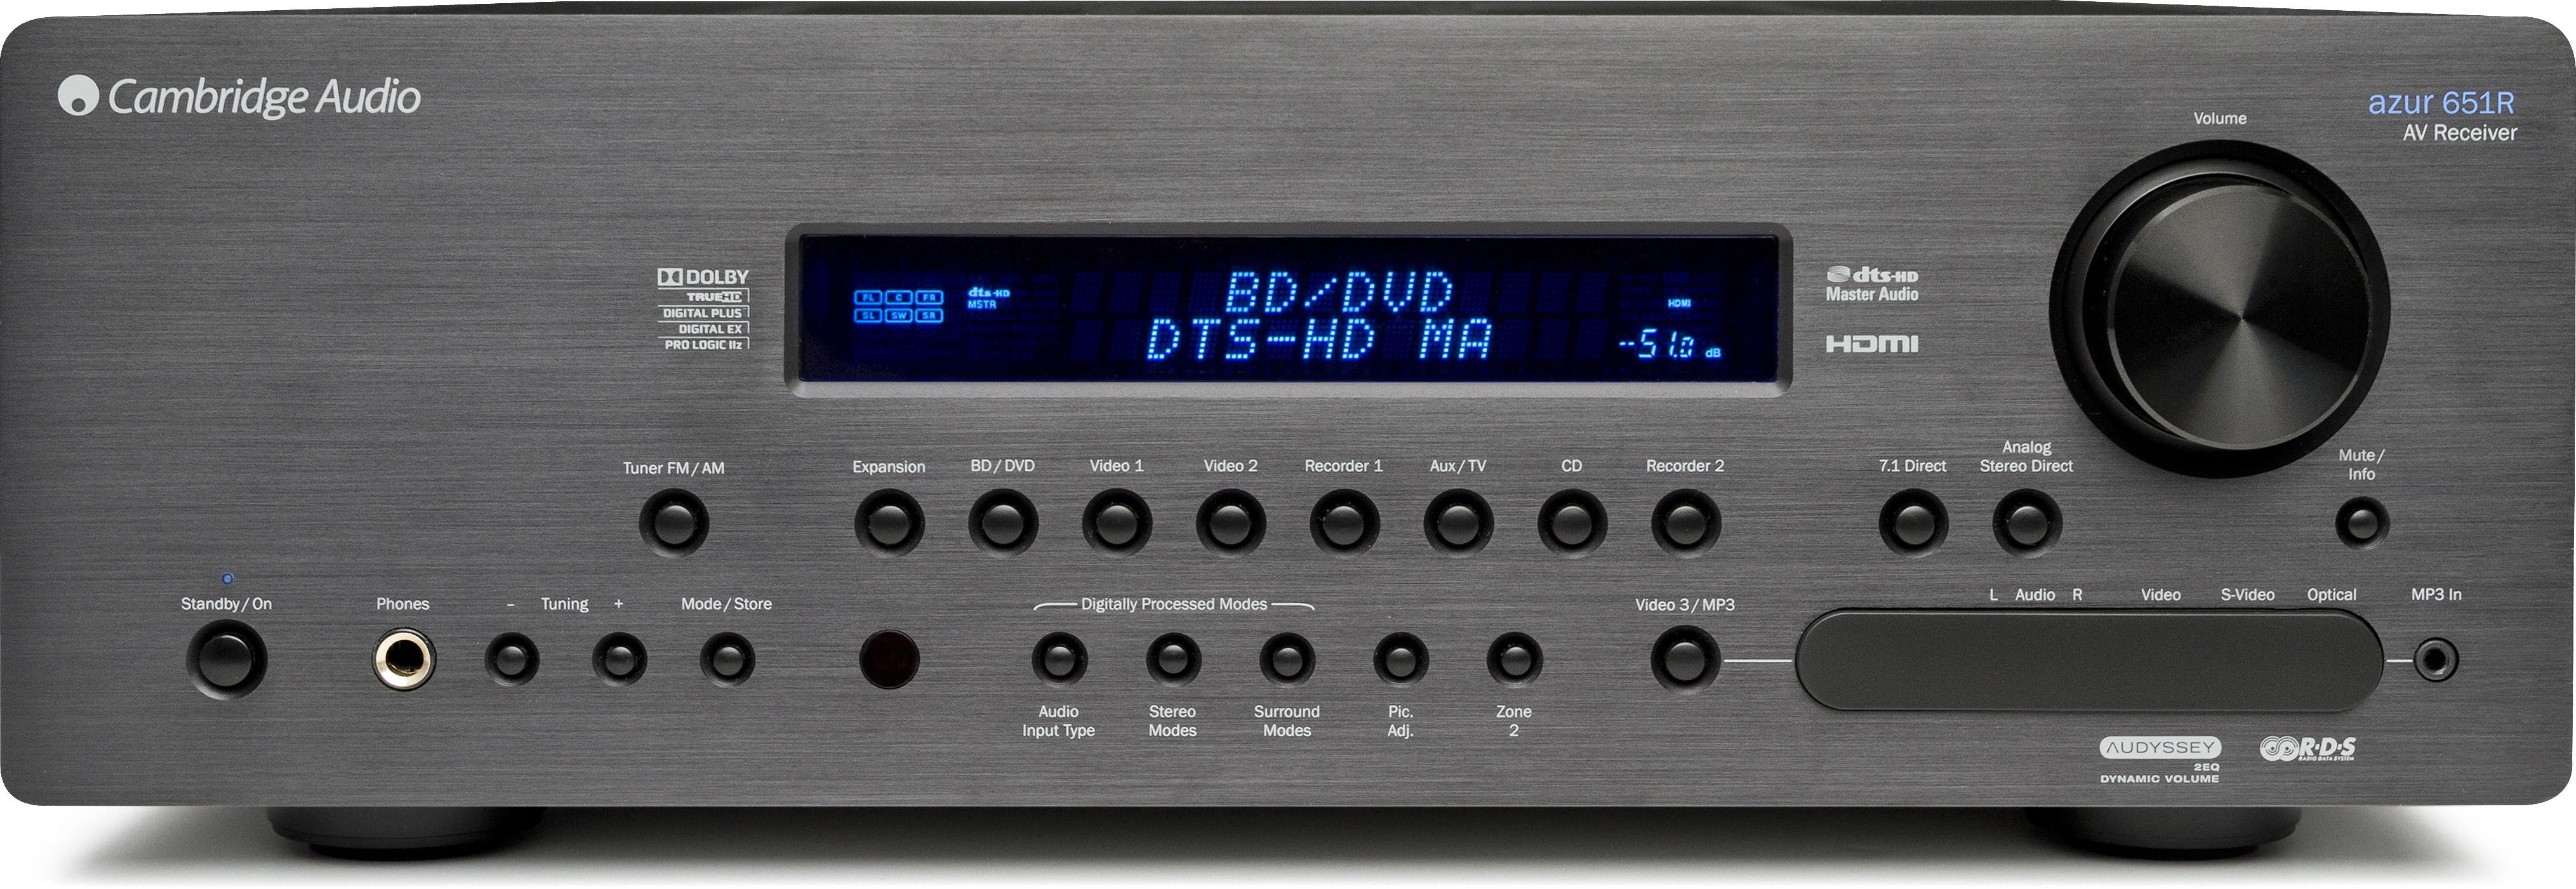 Details about Cambridge Audio Azur 651R Home Theater Receiver 7 1  Multi-Channel (Black)